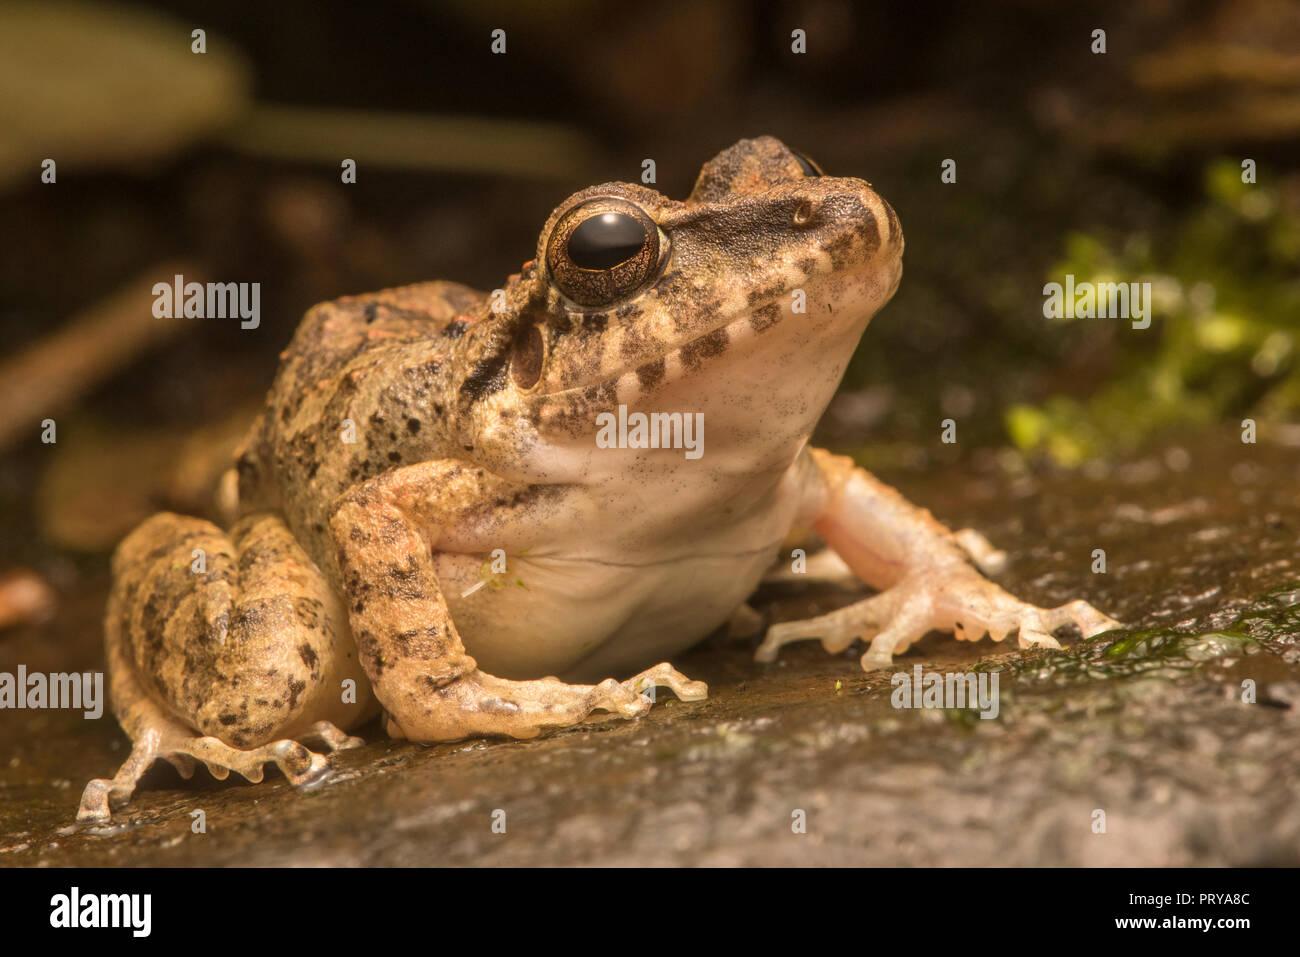 A jungle frog from Manu national Park, Peru. - Stock Image